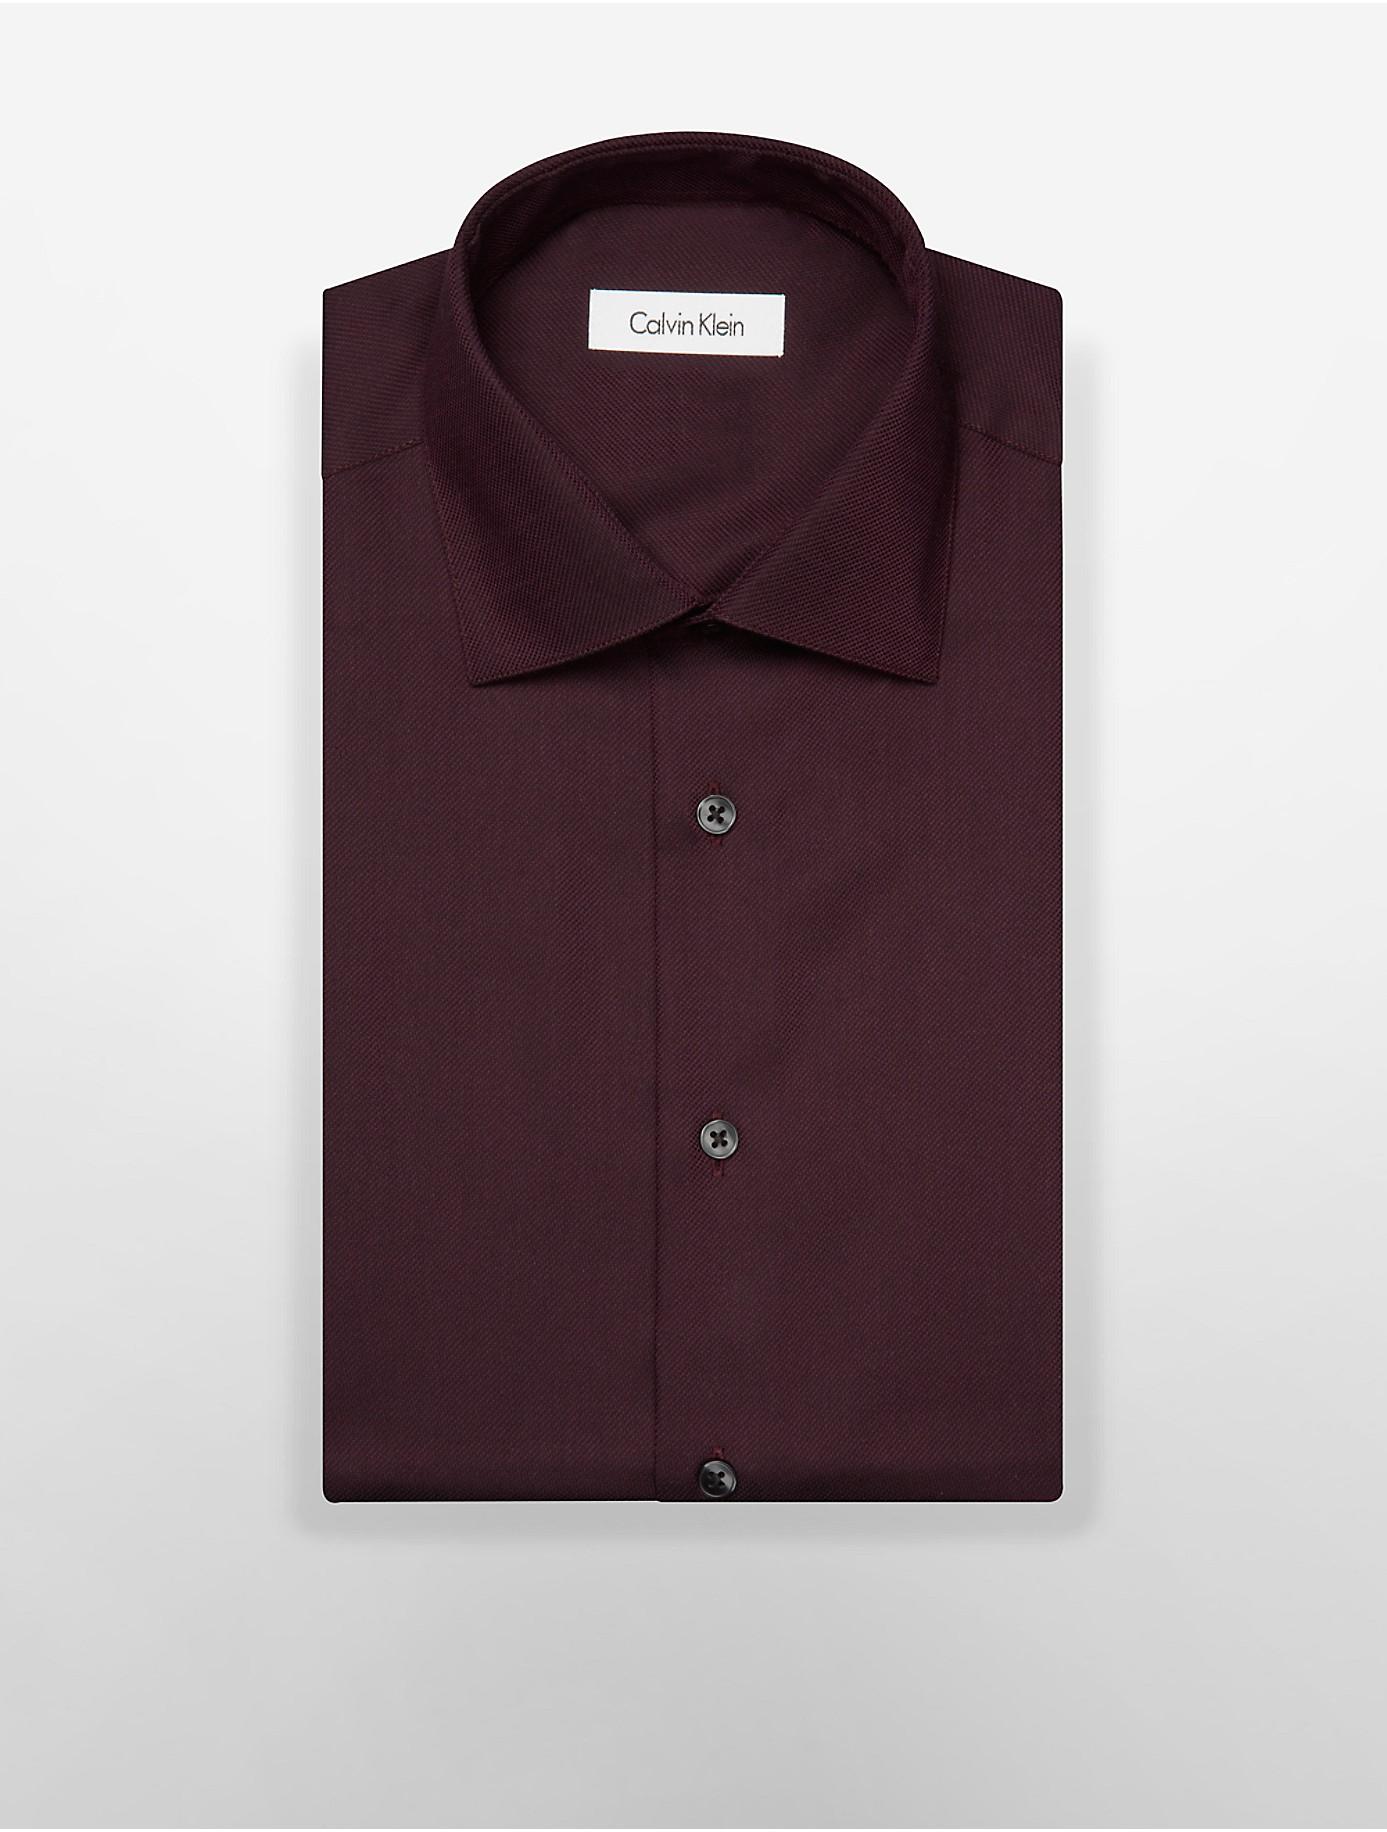 Calvin klein regular fit non iron oxford dress shirt in for Regular fit dress shirt